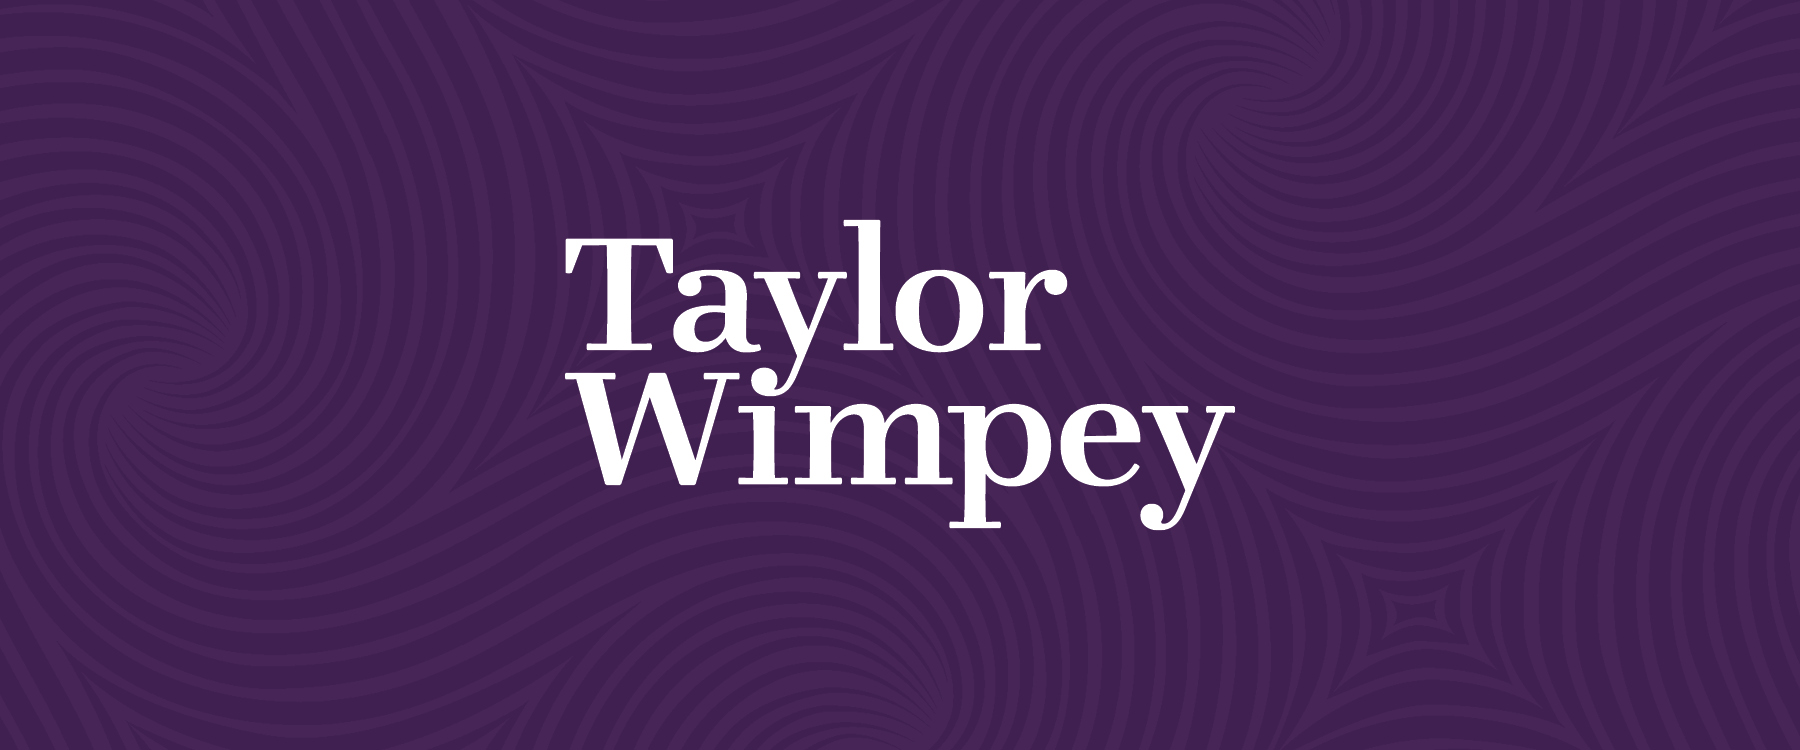 reflexblue Taylor Wimpey 1800 x 750 Lead Image